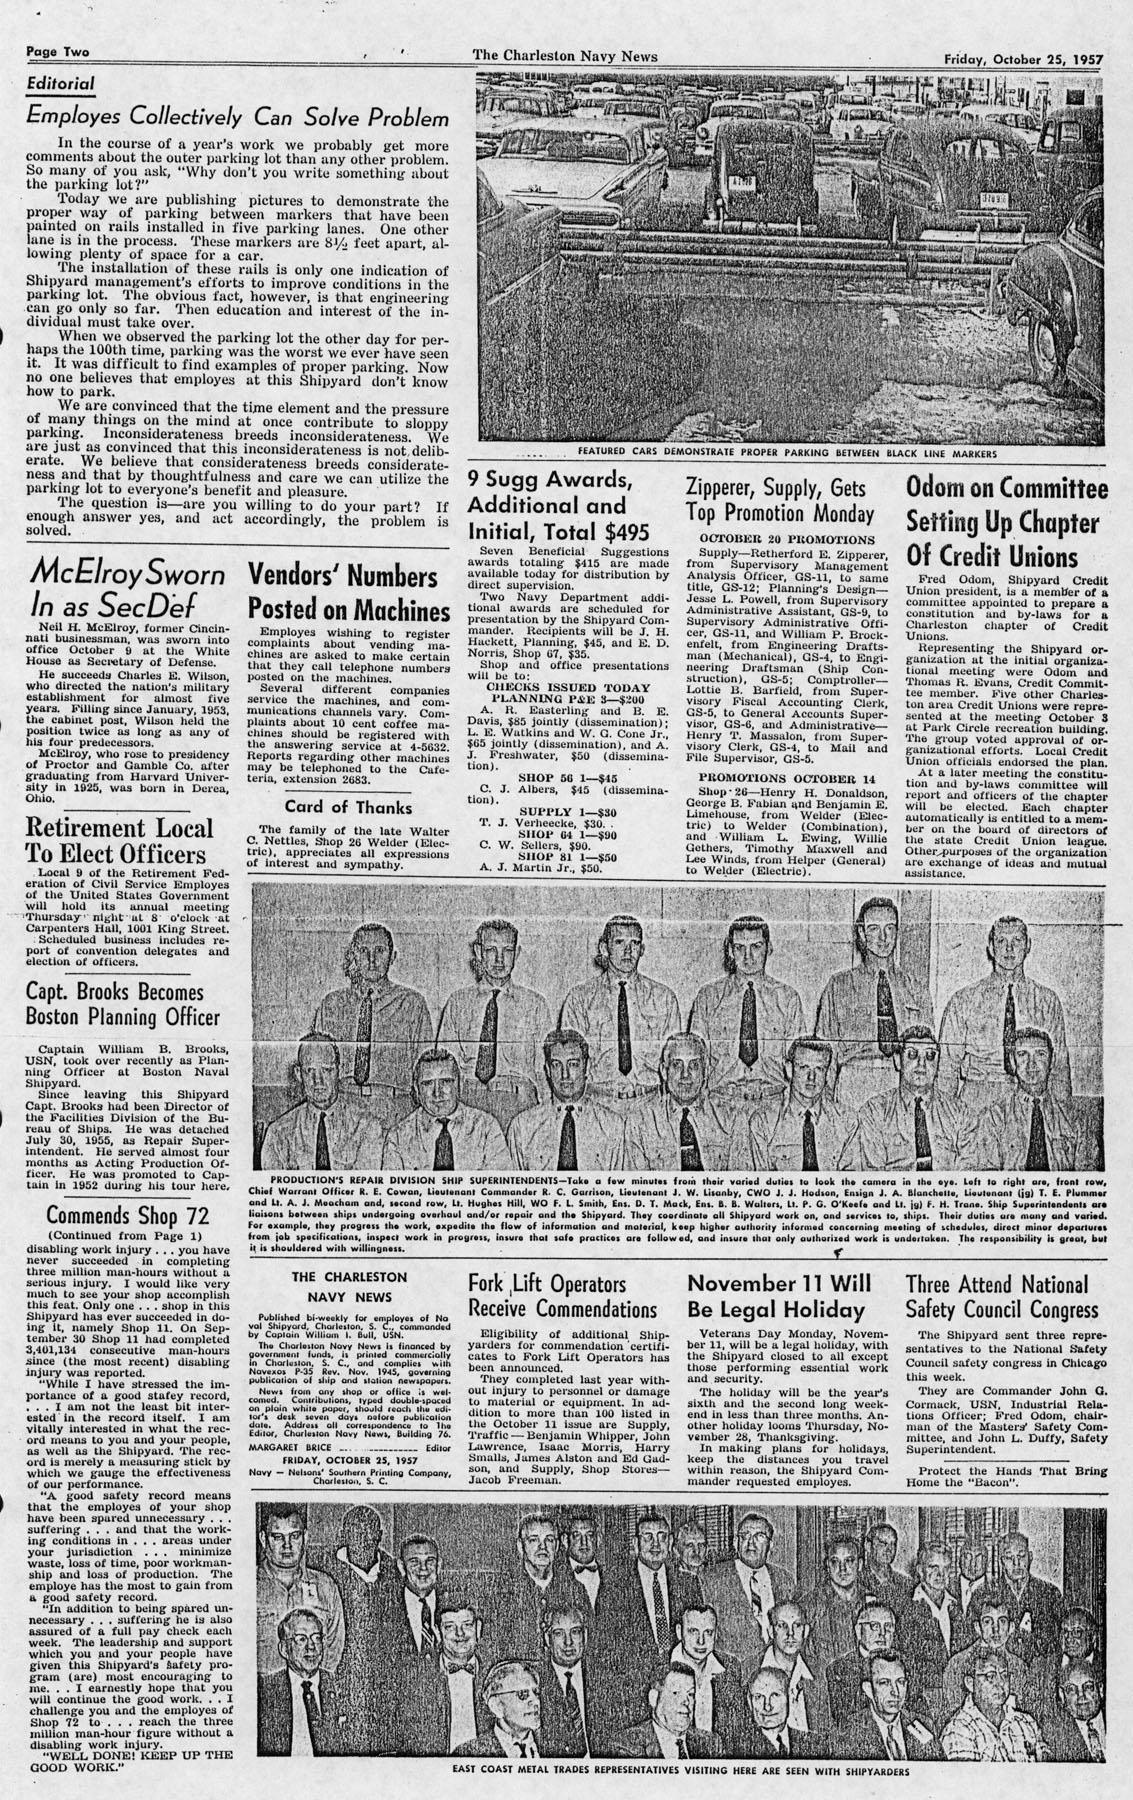 The Charleston Navy News, Volume 16, Edition 7, page ii